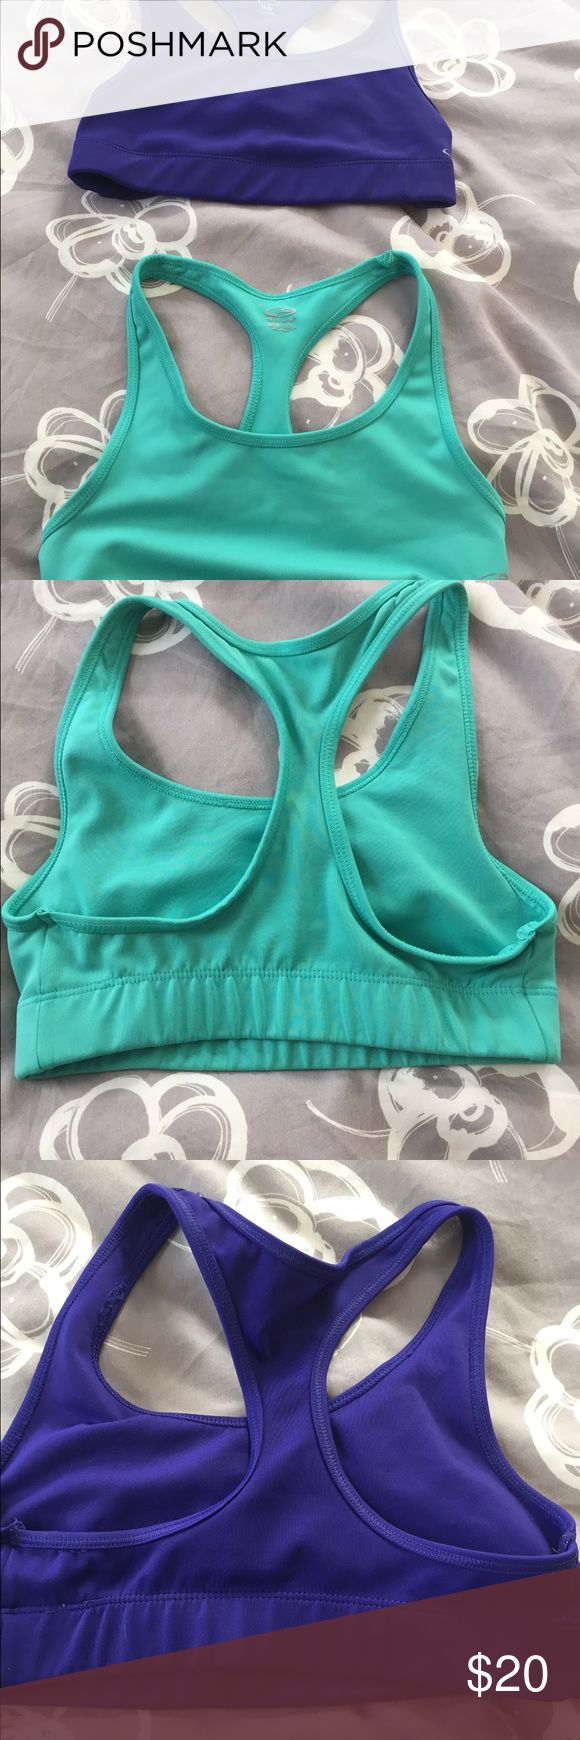 2 champion sports bras. Purple & aqua champion sports bras. Size medium.  Great condition. Intimates & Sleepwear Bras